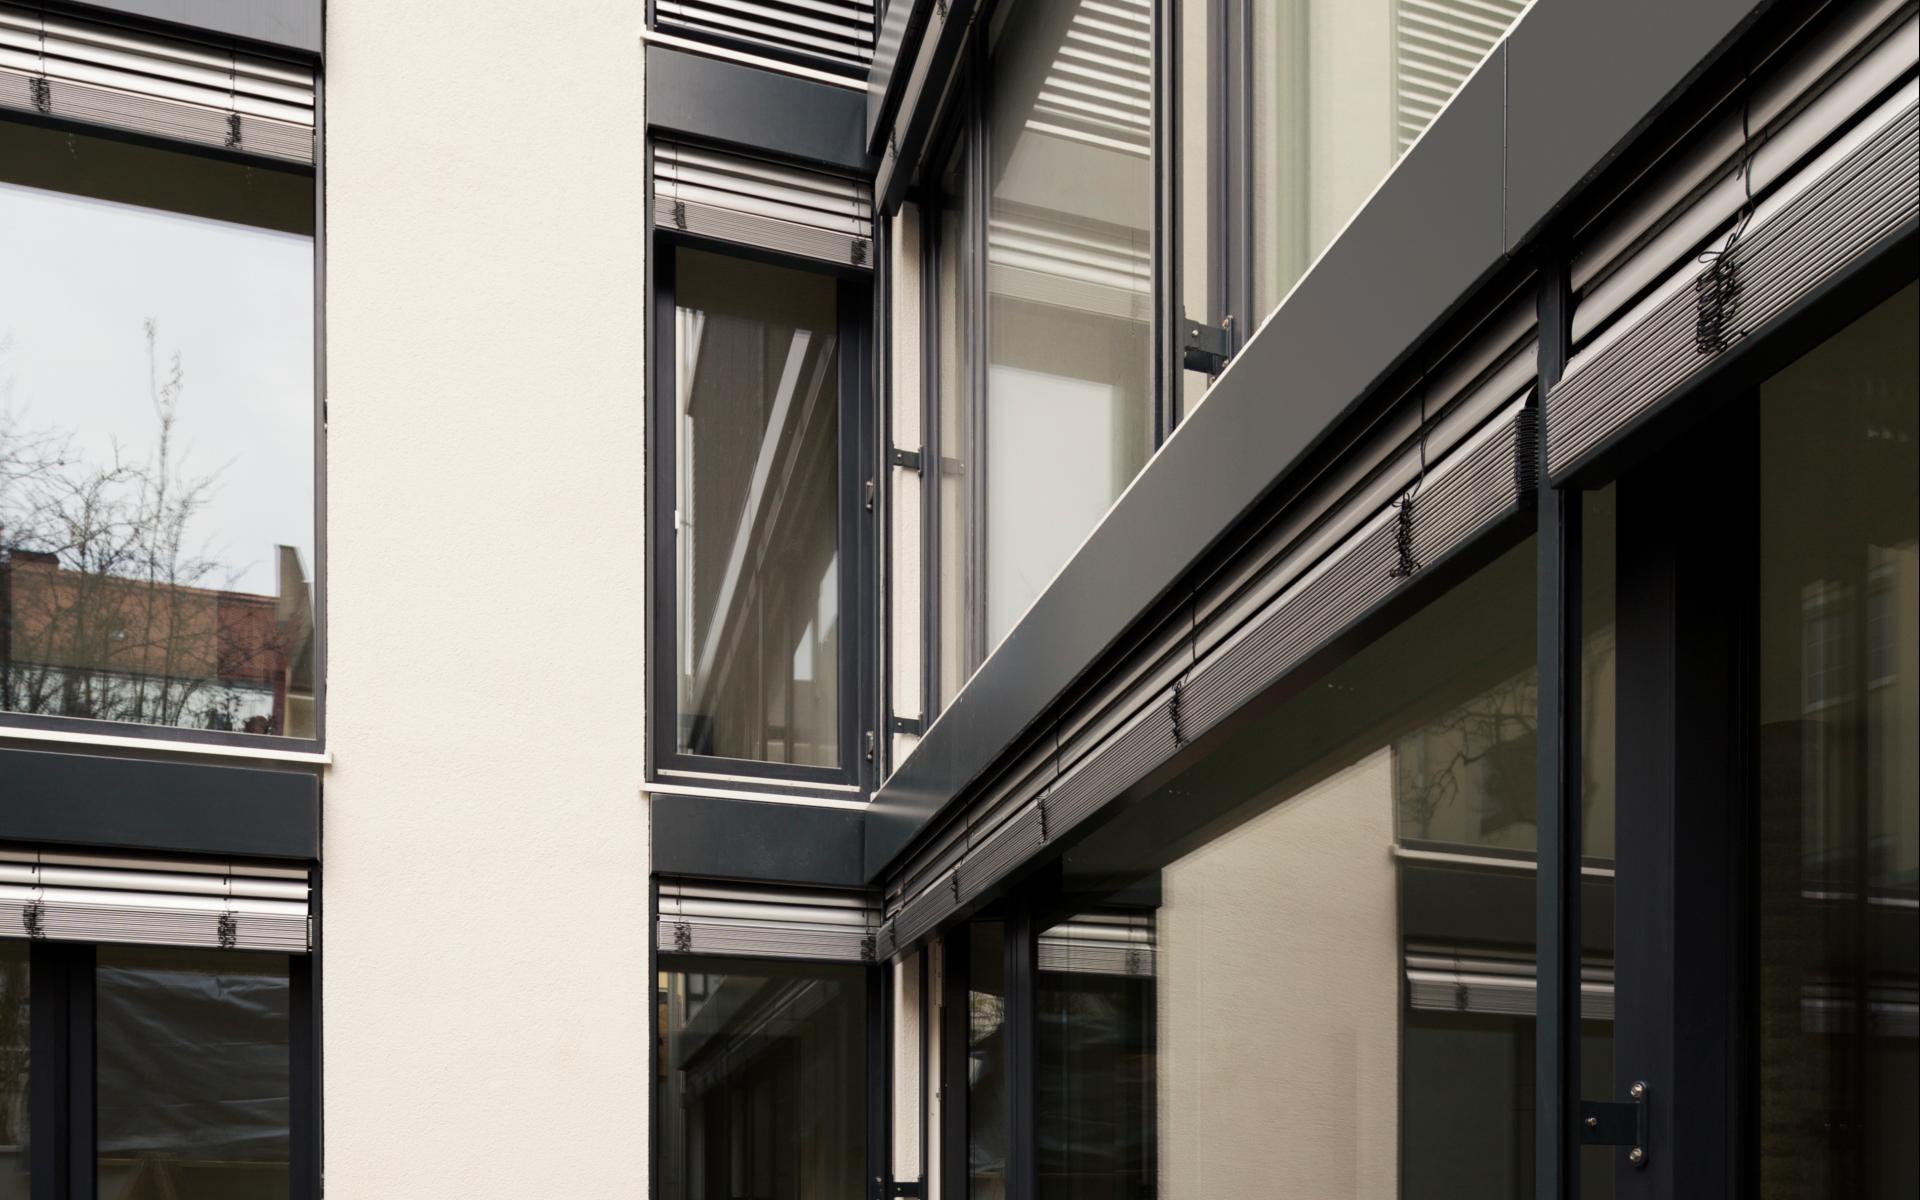 LHOMES_Walchenseeplatz_Fassade_1920x1200